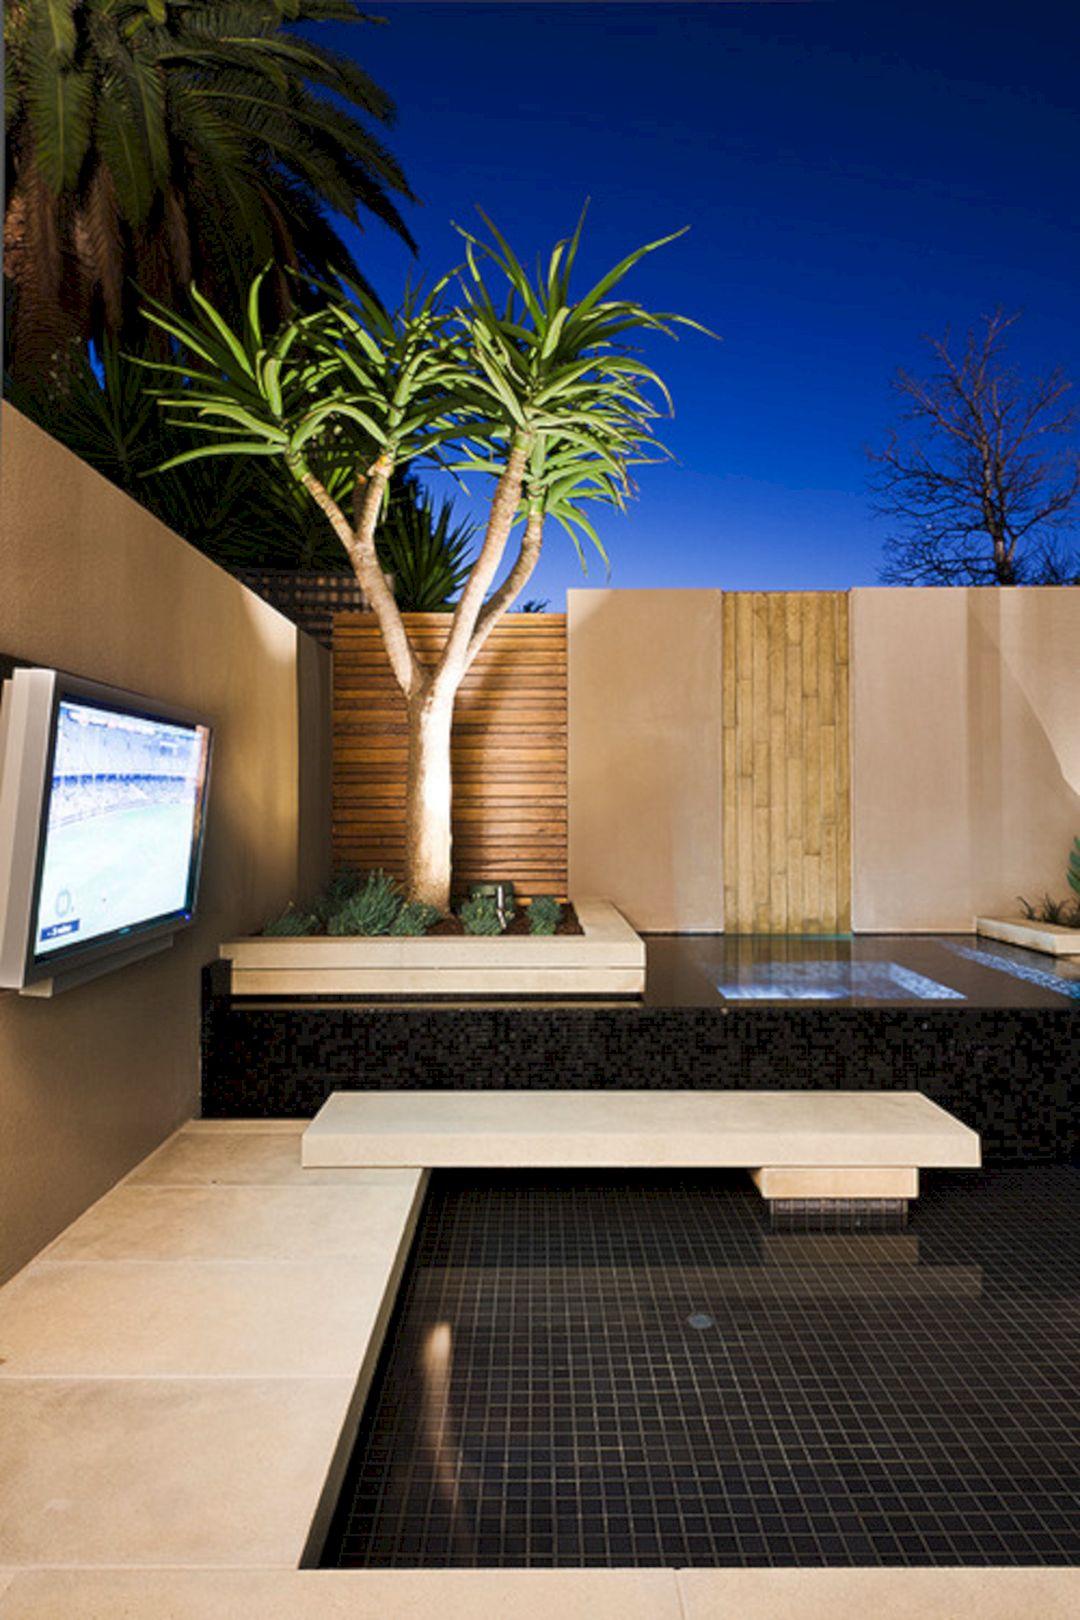 Garden Ideas Small Landscape Gardens Pictures Gallery: Minimalist Landscape Design Ideas (Minimalist Landscape